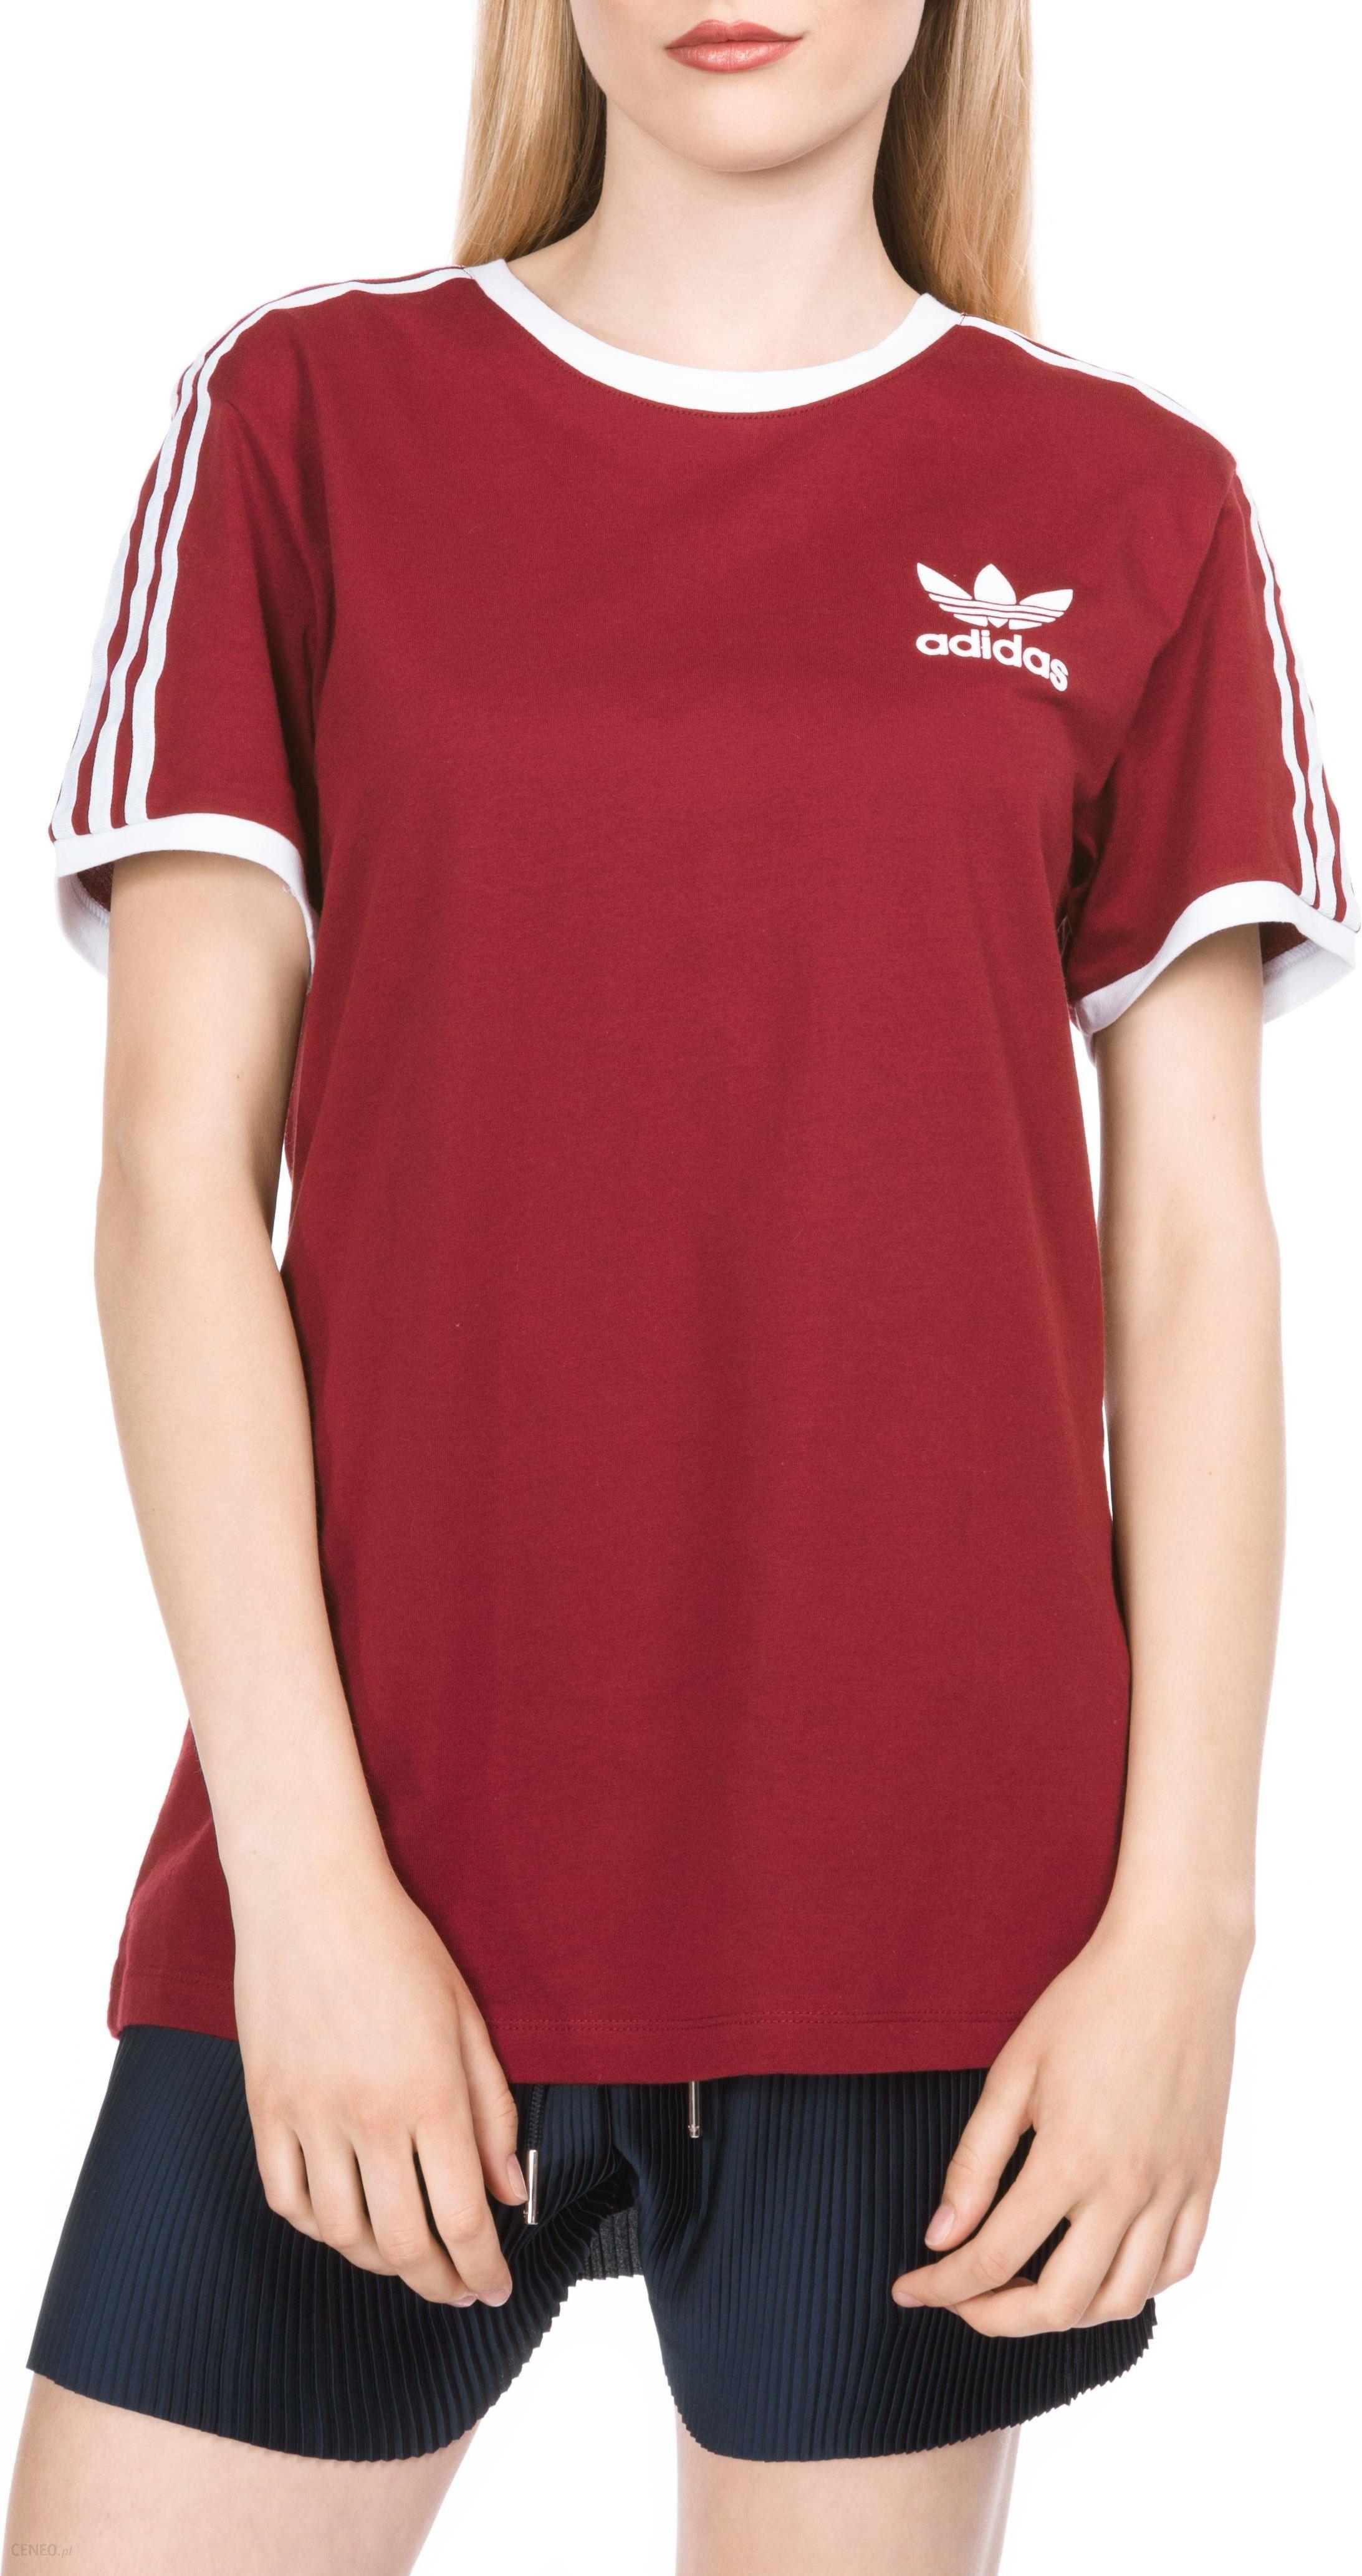 ADIDAS ORGINALS • 3 STRIPES TEE koszulka (bordowa)